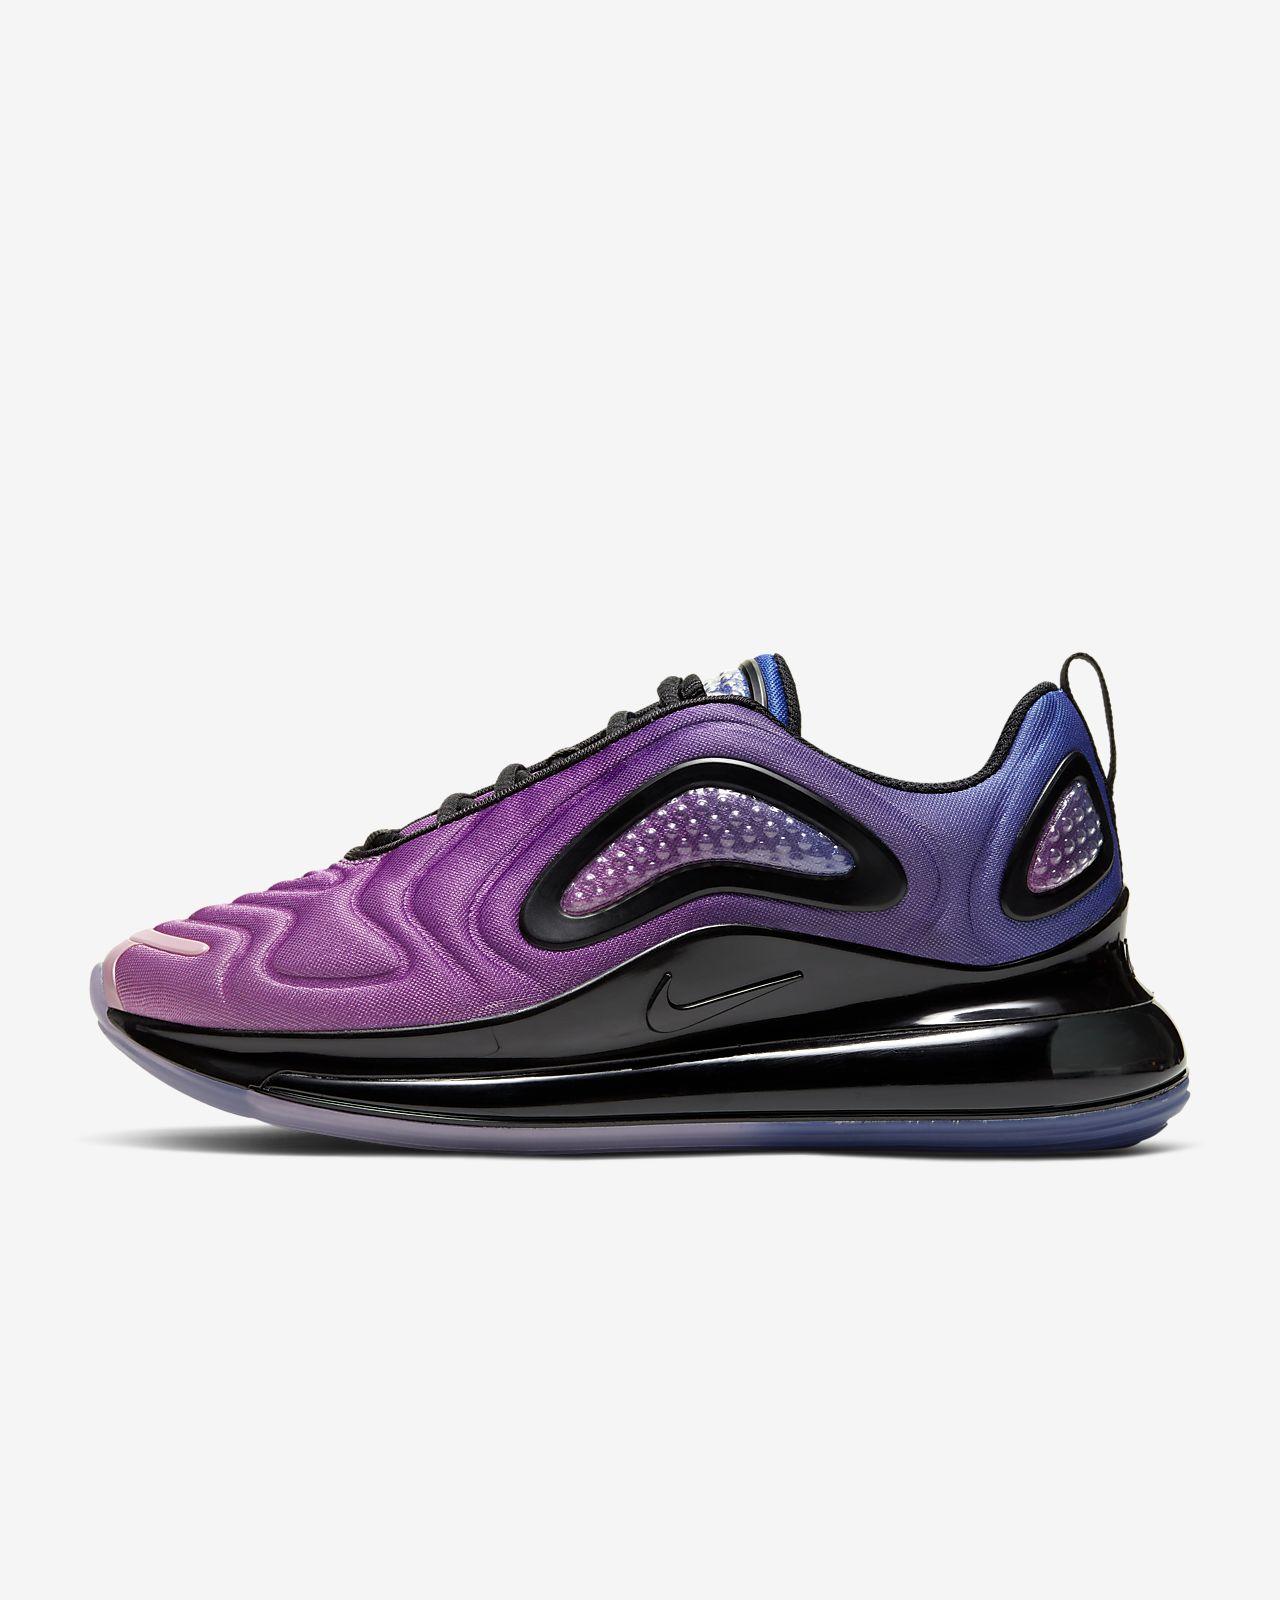 Nike Air Max 720 | CT2204 002 | Svart | Sneakers | Skor | Footish